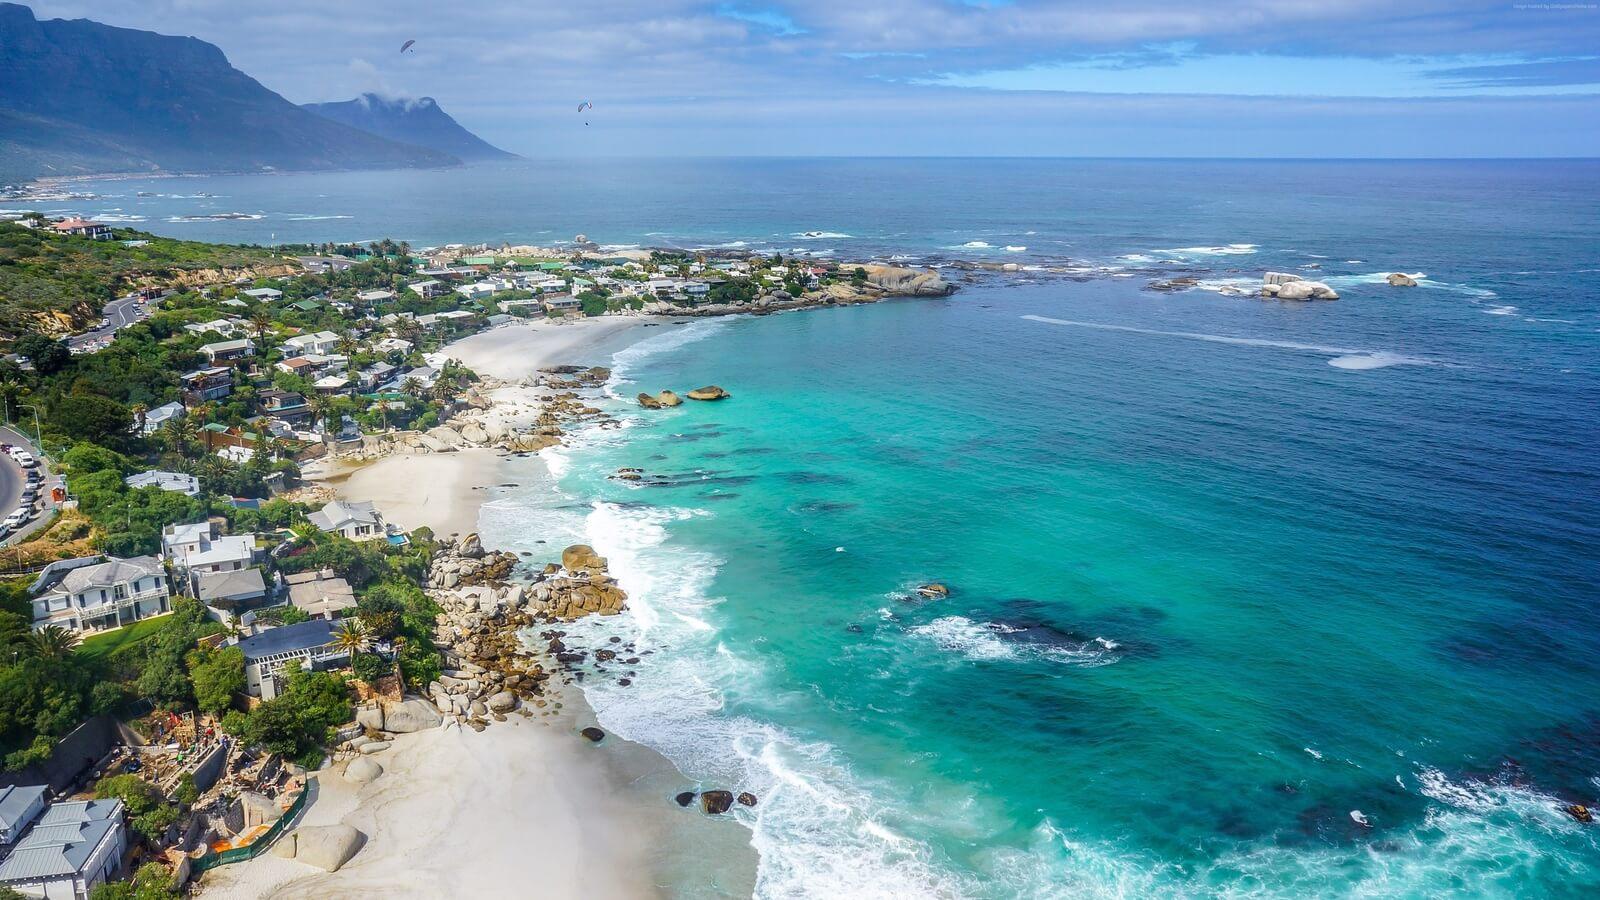 Красивые картинки и фото города Кейптауна - сборка 1